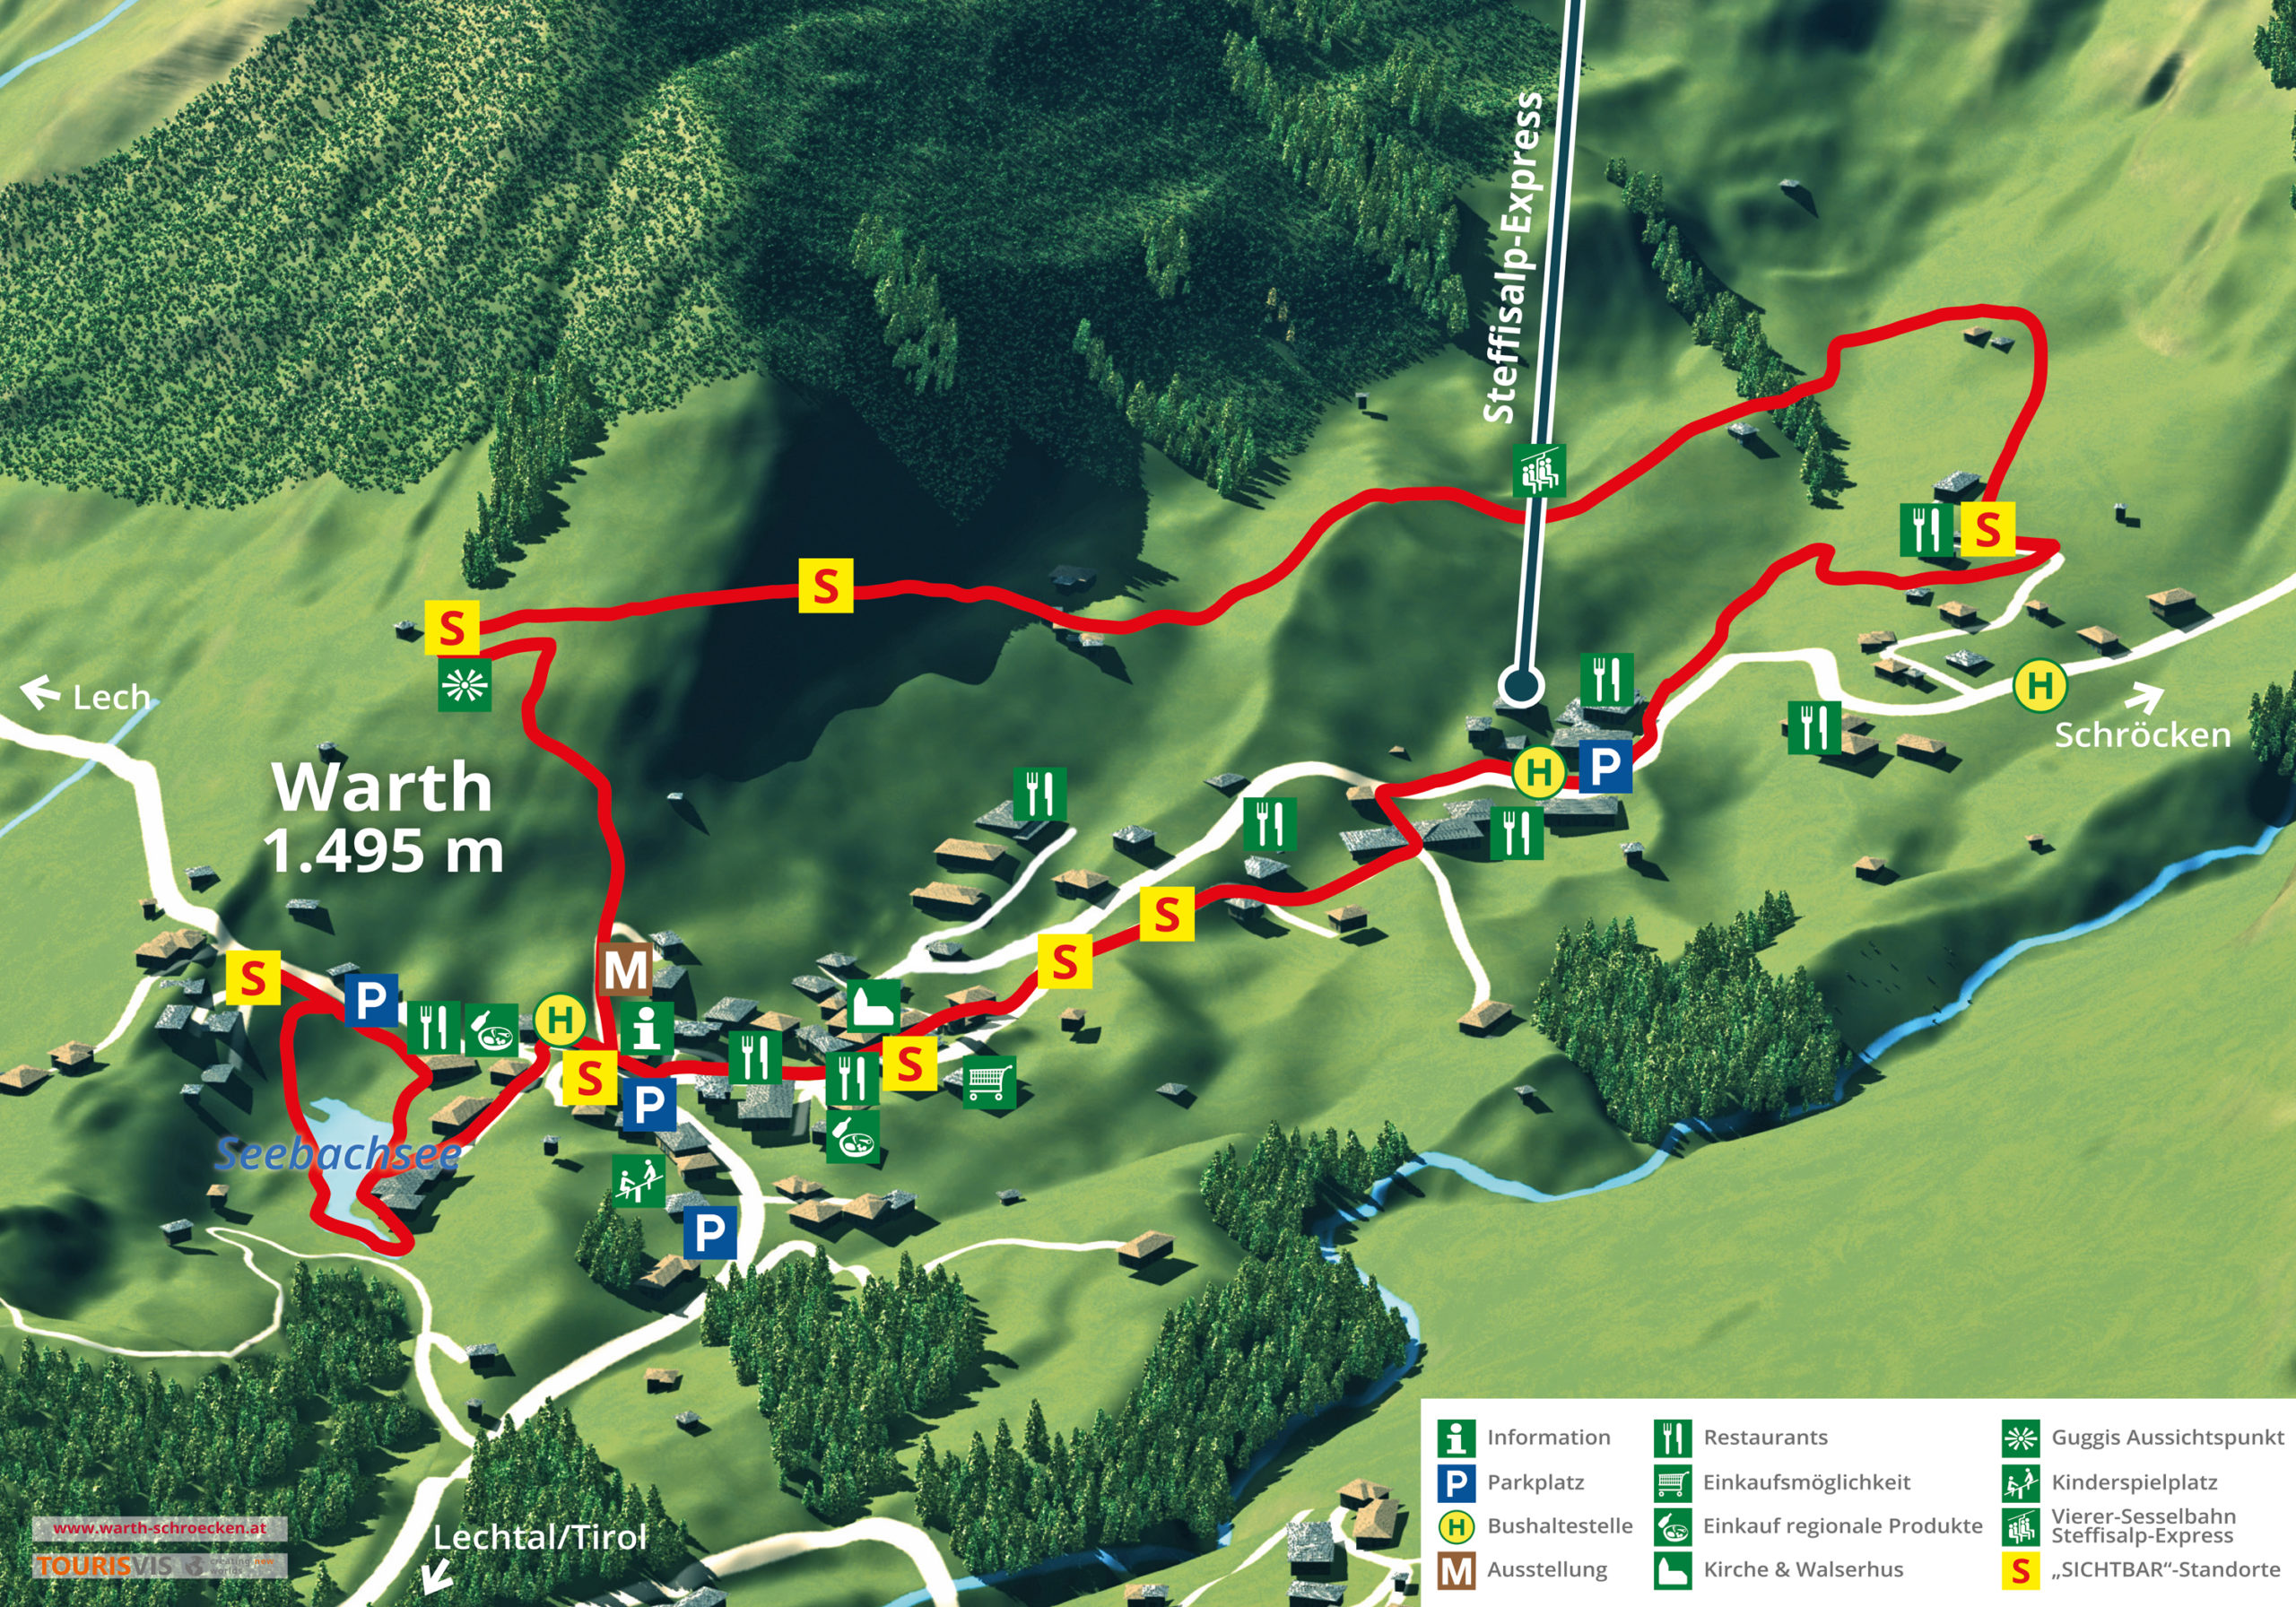 3D Panoramakarte Wandern - Dorfrundweg Warth